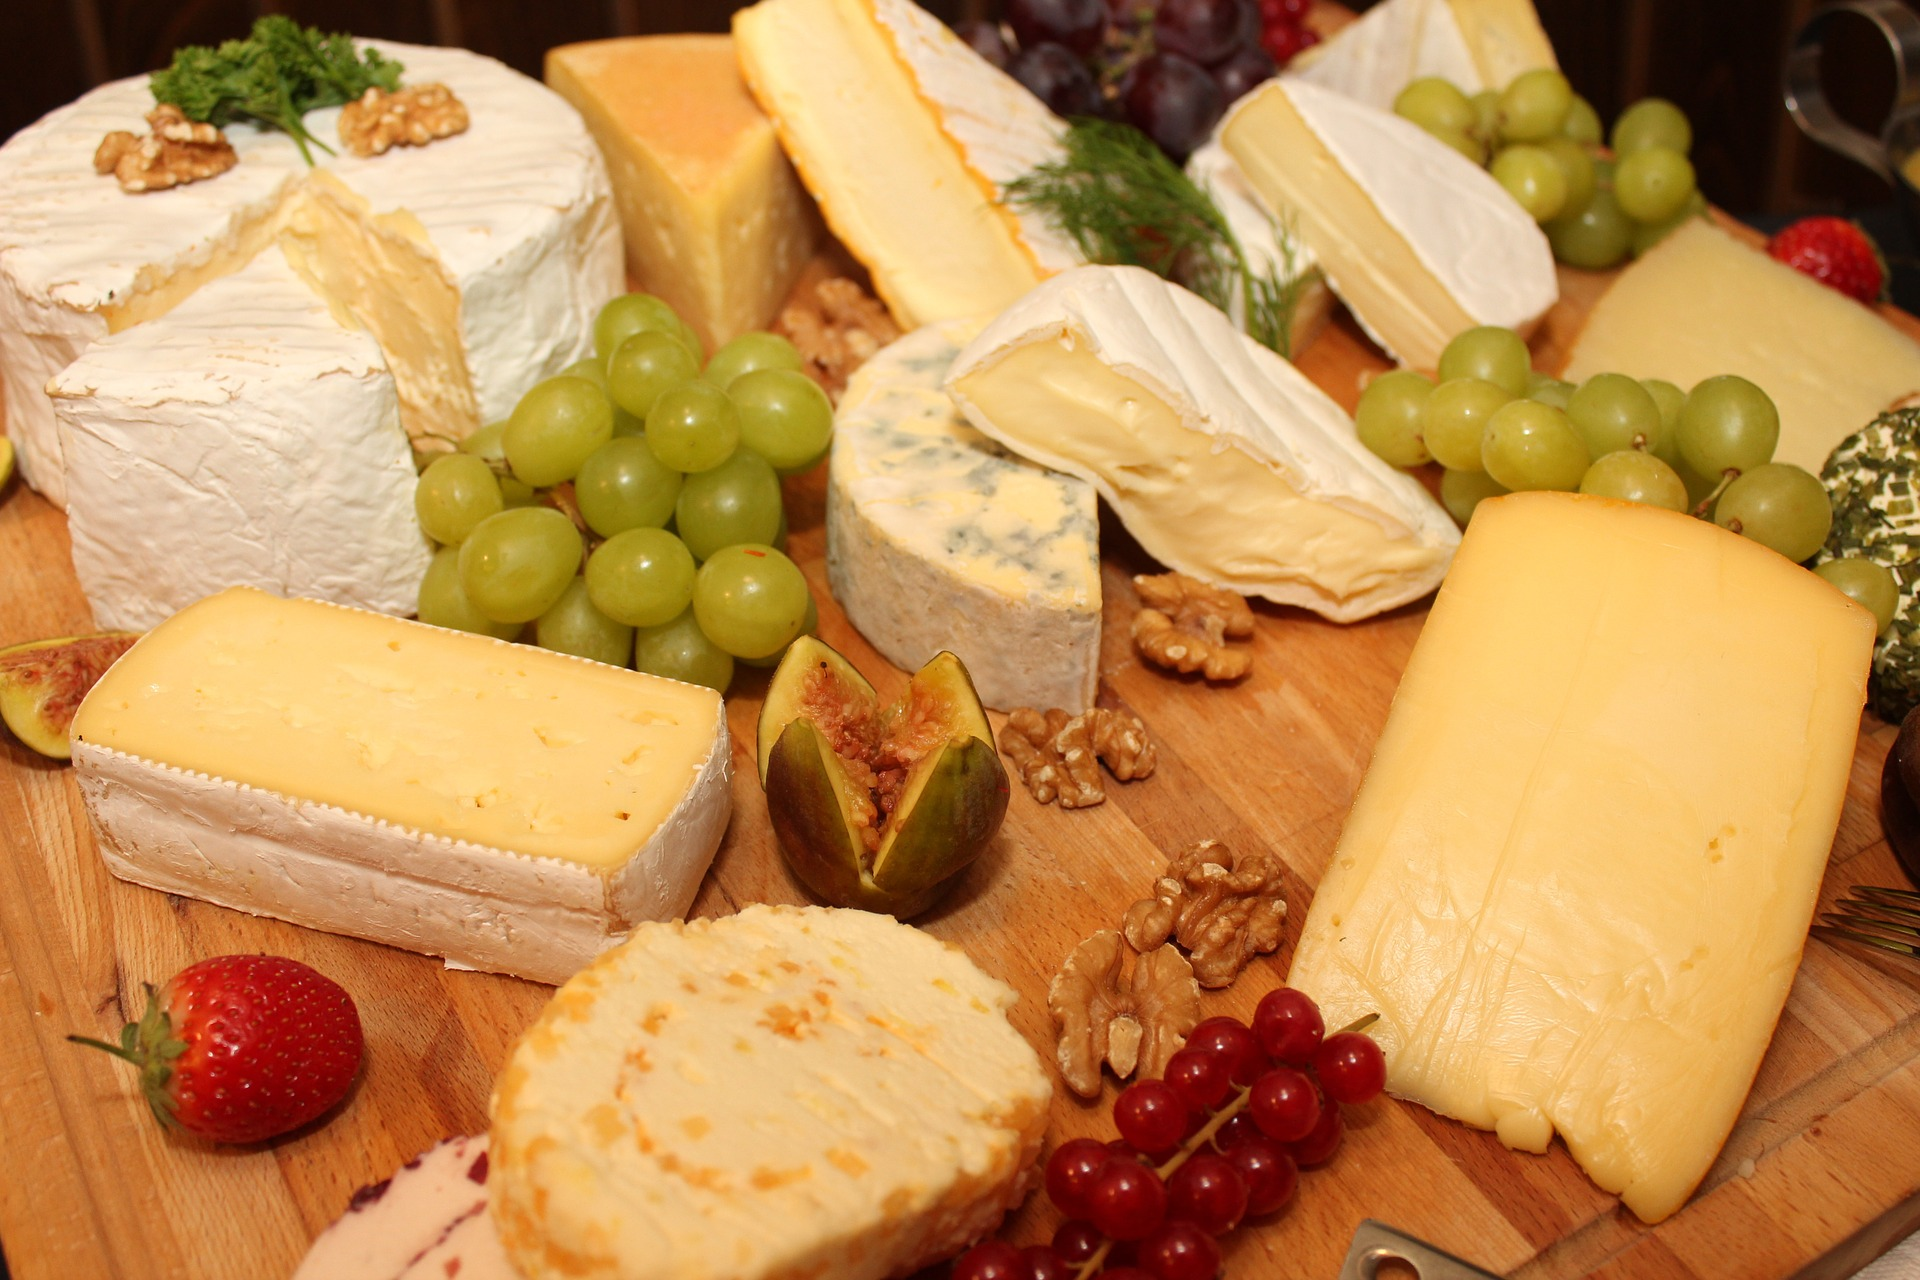 Cheese Festival | HNBS pixabay.com